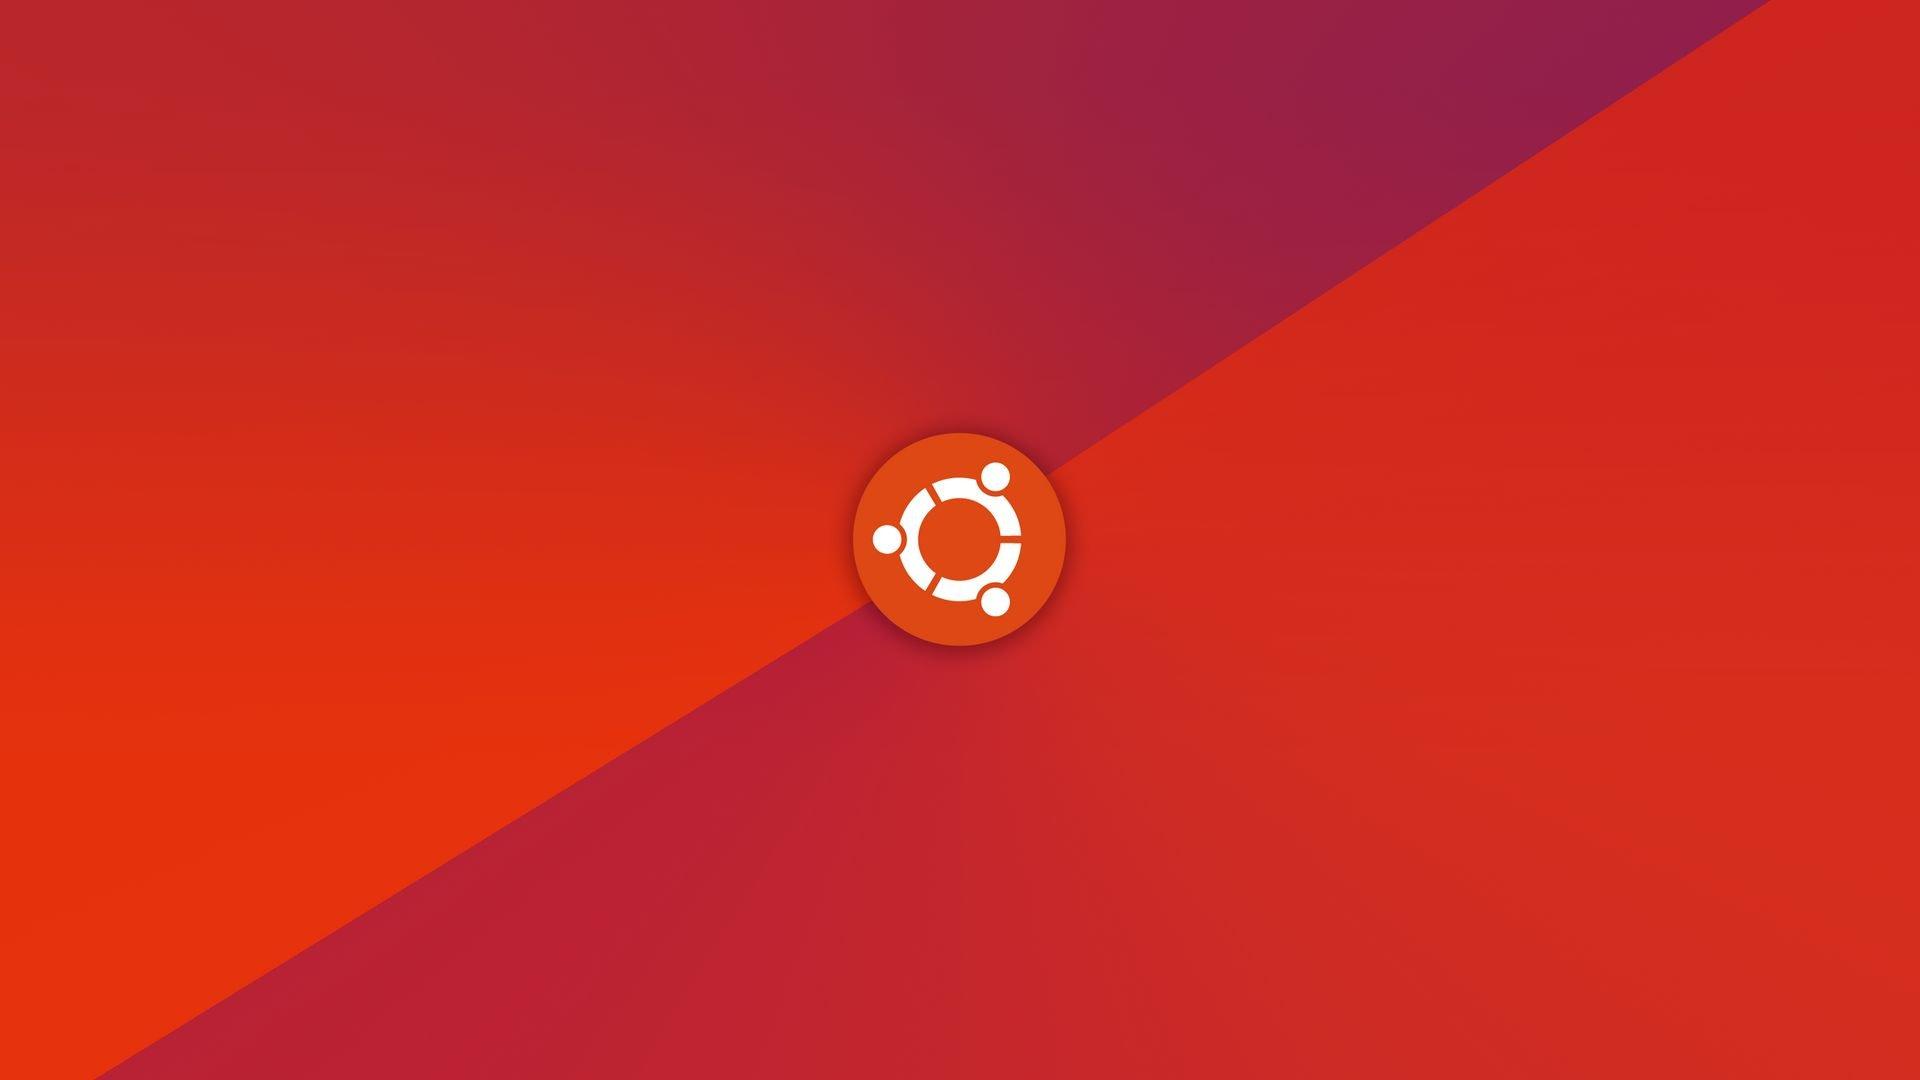 ubuntu linux logo - Canonical (ξανά) νέα ISO για το Ubuntu 20.04.2 LTS